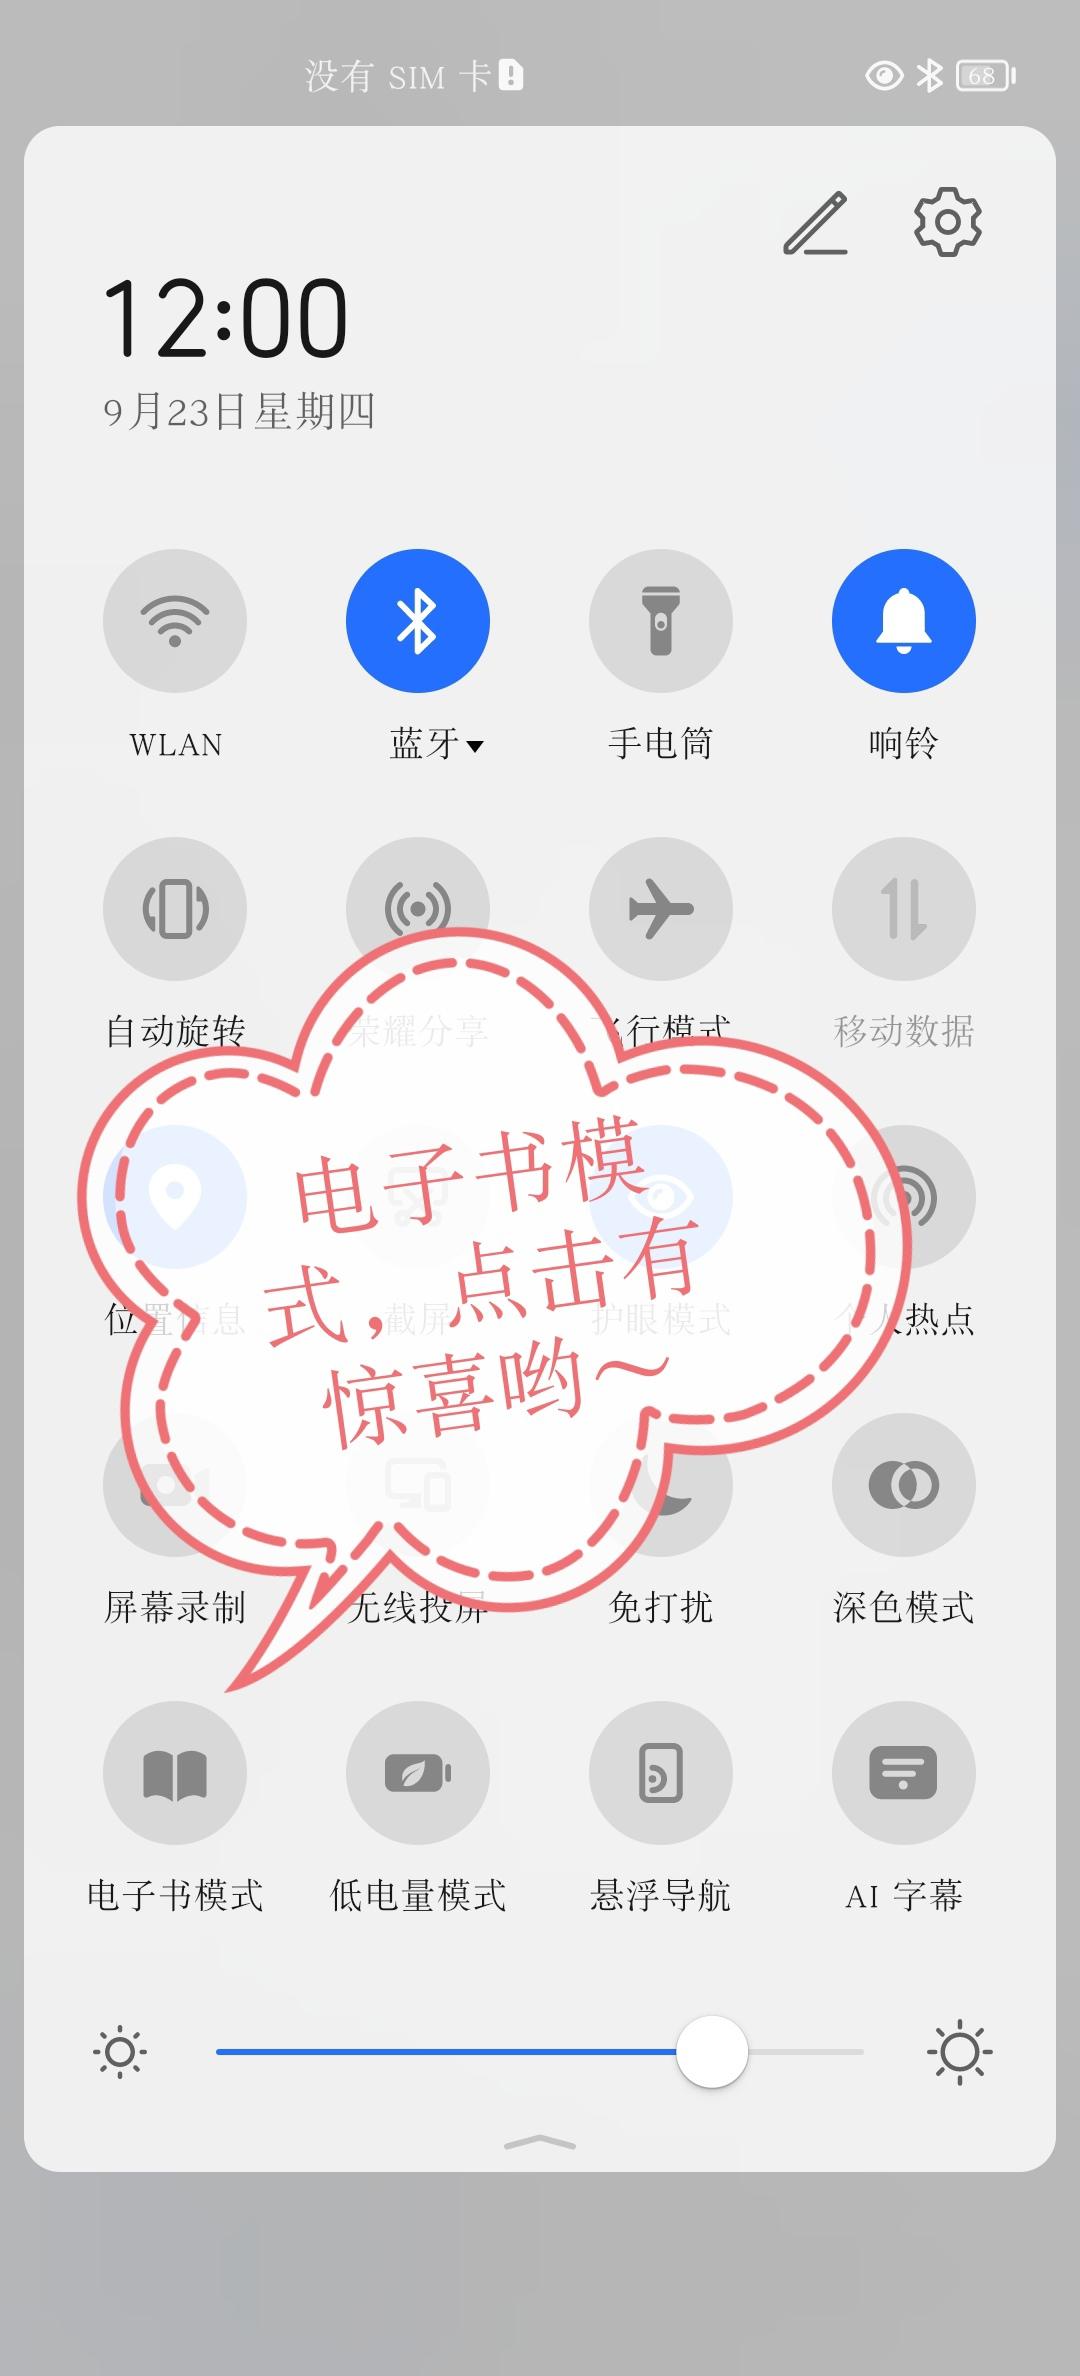 Screenshot_20210923_120035_edit_279339858162879.jpg